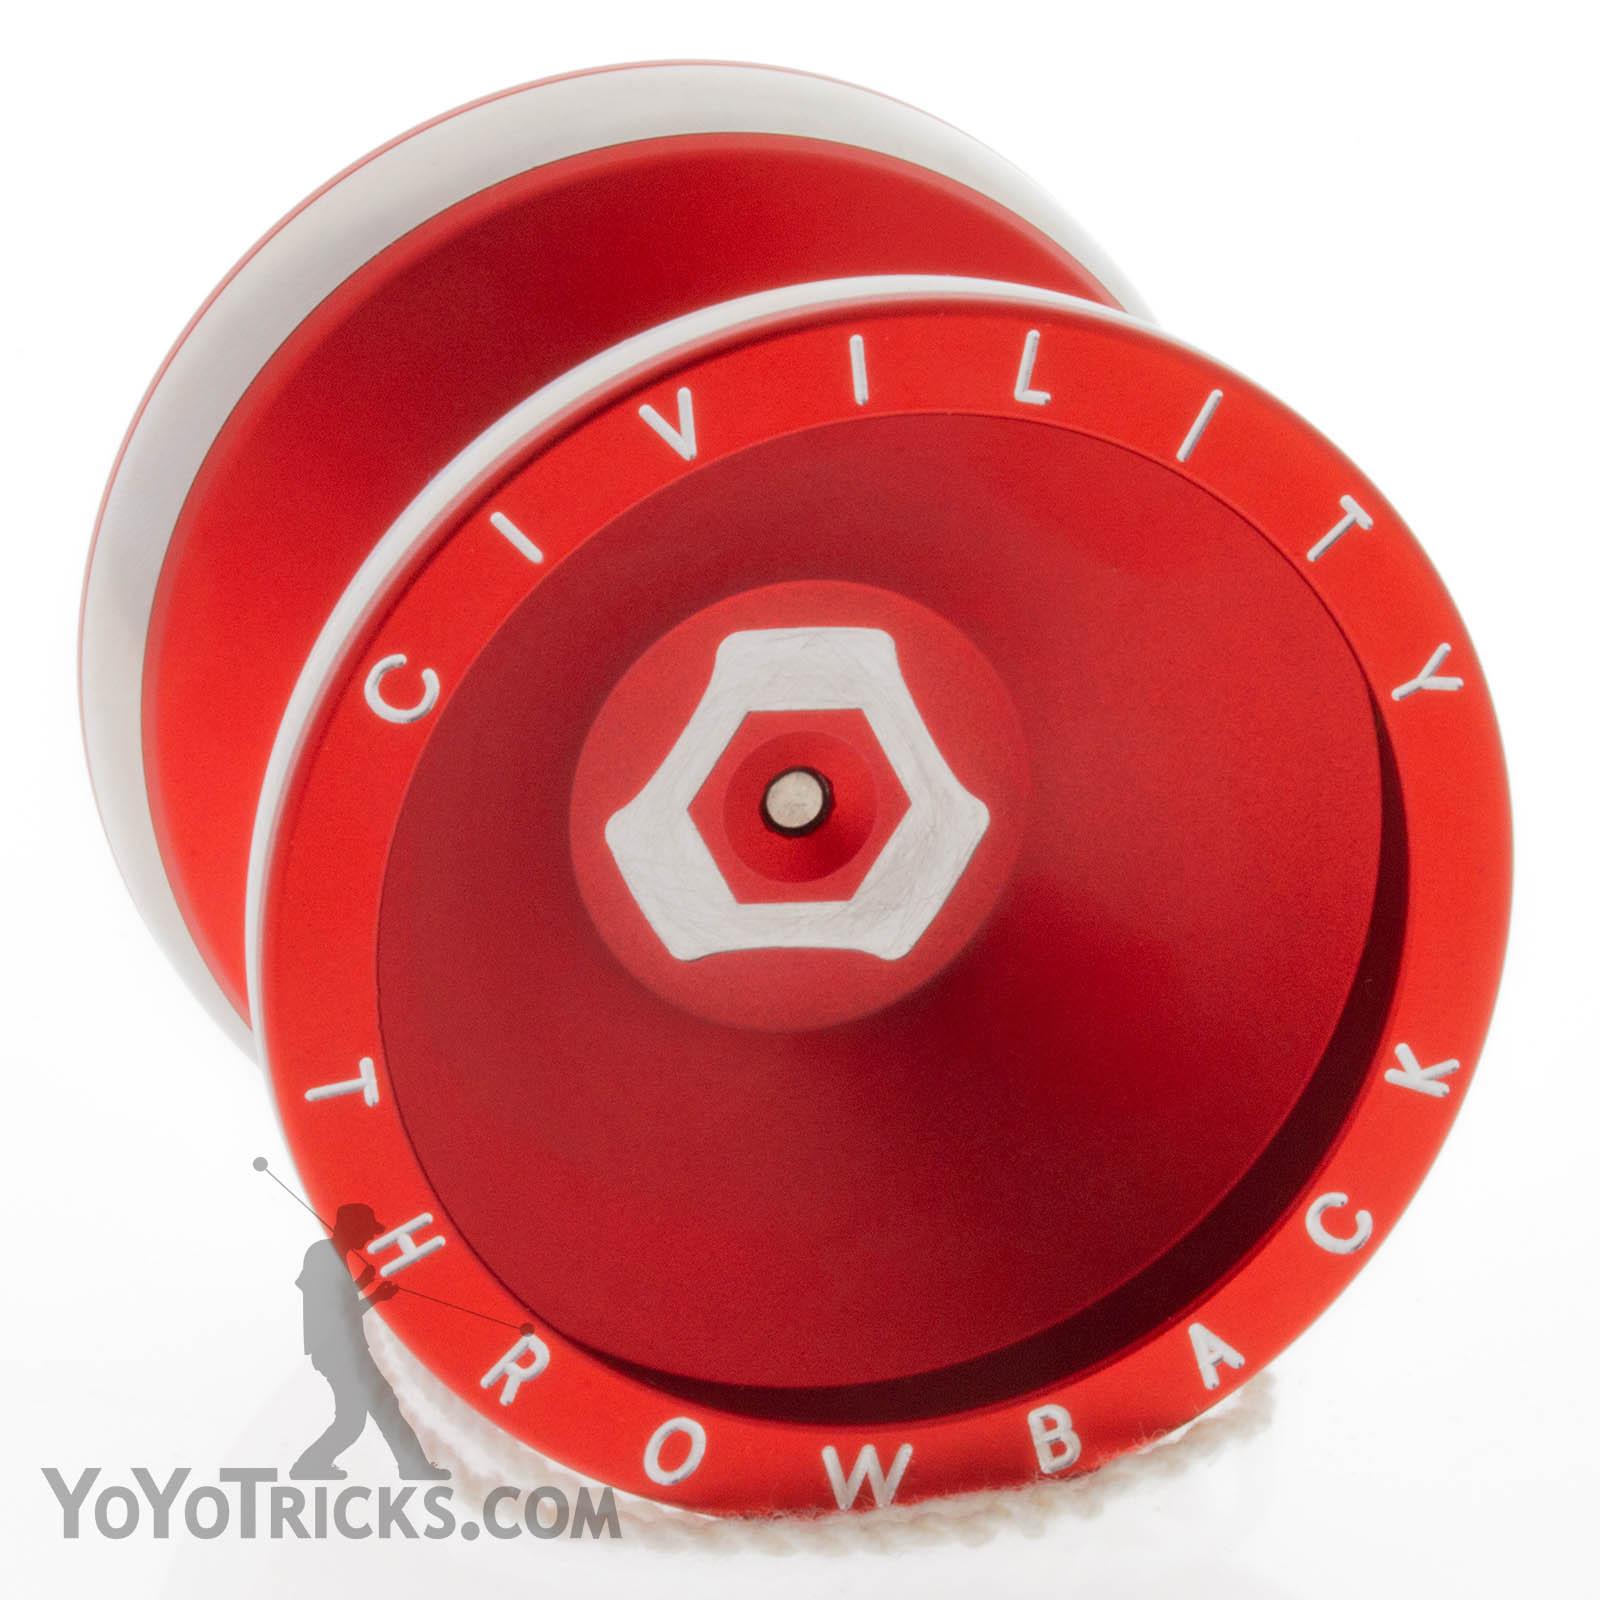 Civility yoyo - Best Budget Bimetal yoyo